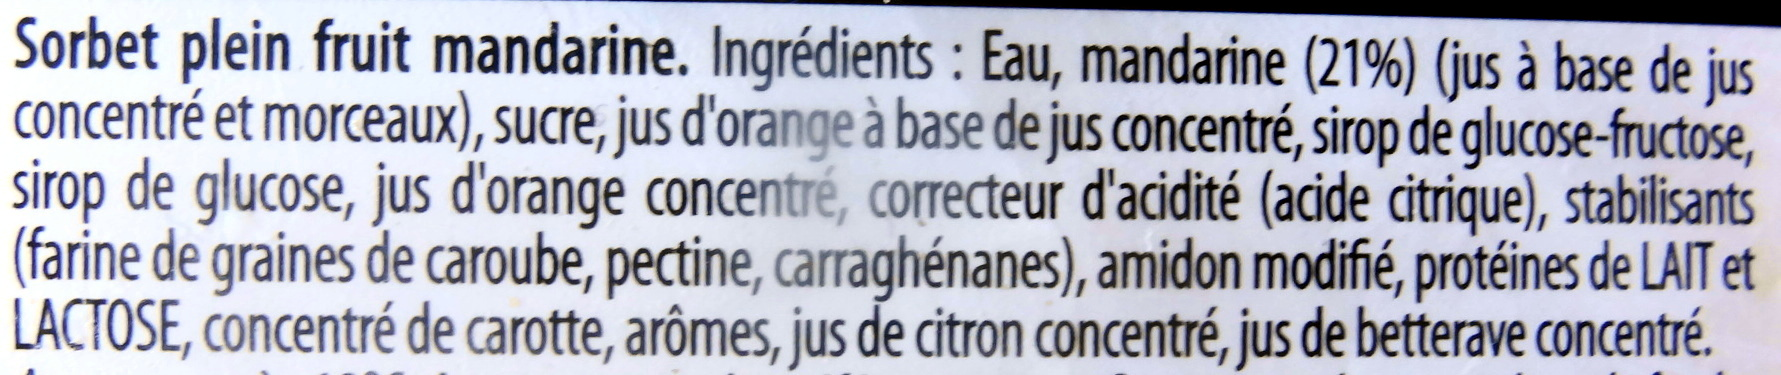 Sorbet plein fruit, mandarine - Ingrediënten - fr